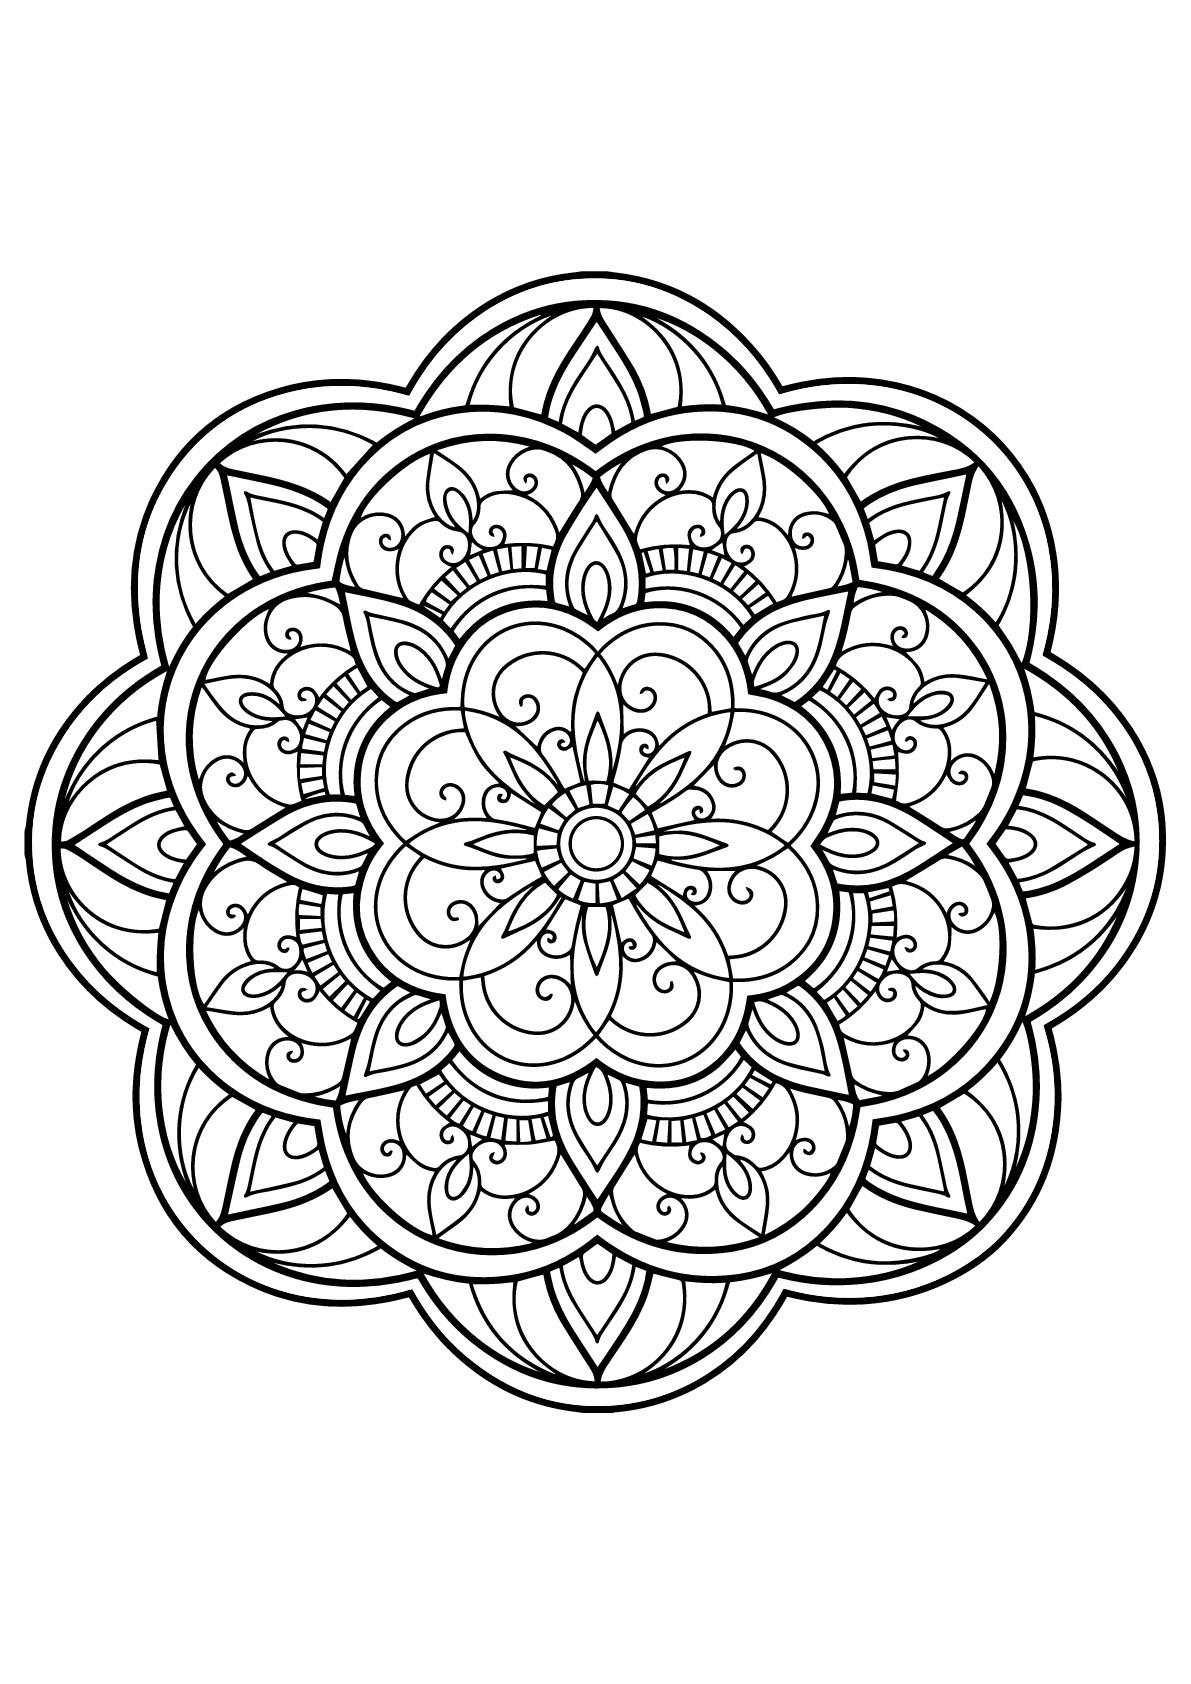 Mandala Complexe Livre Gratuit 14